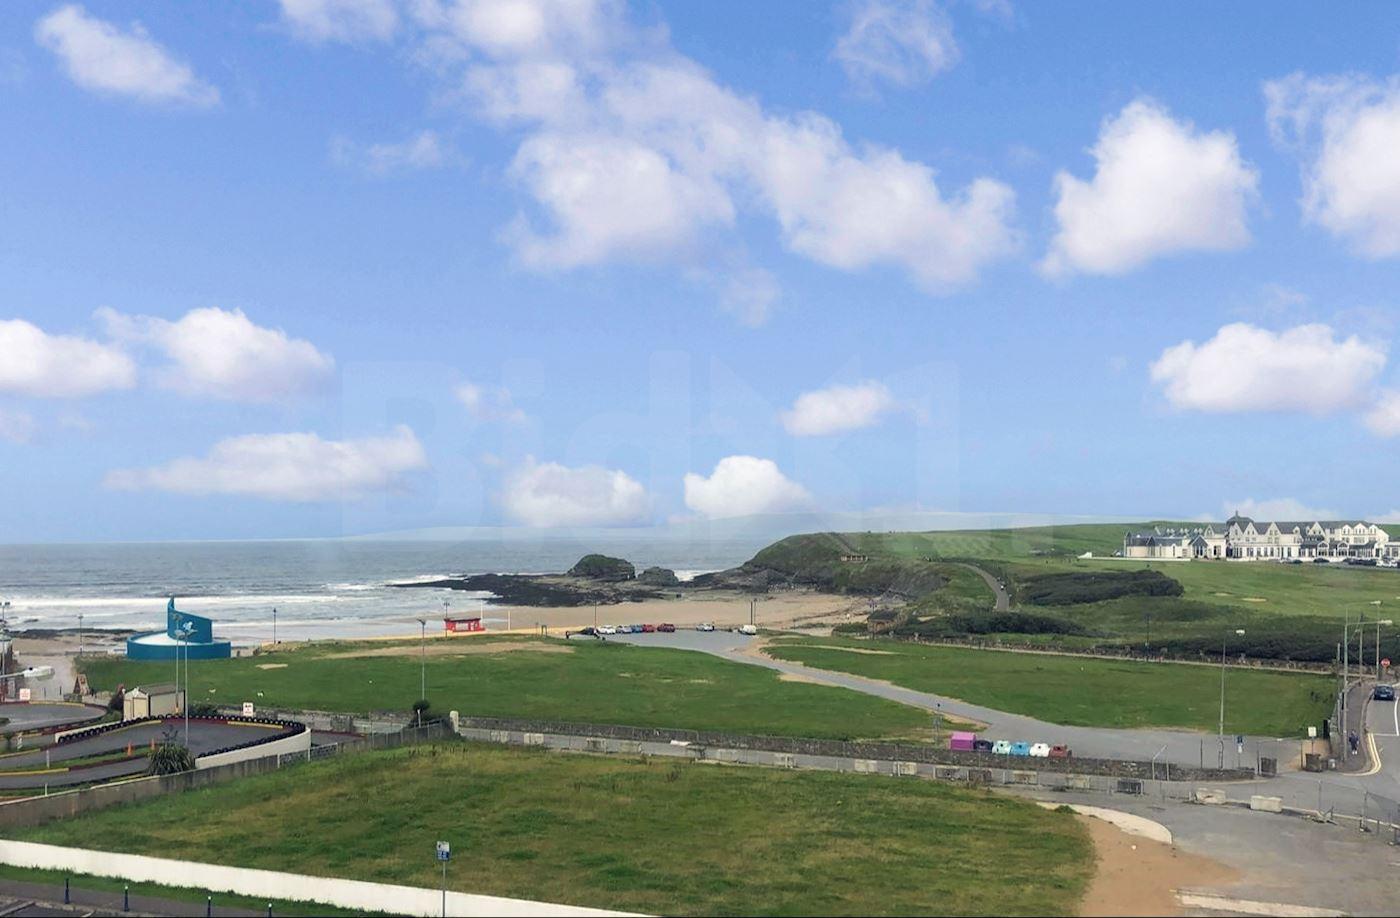 Bundoran beach regains Blue Flag - The Fermanagh Herald